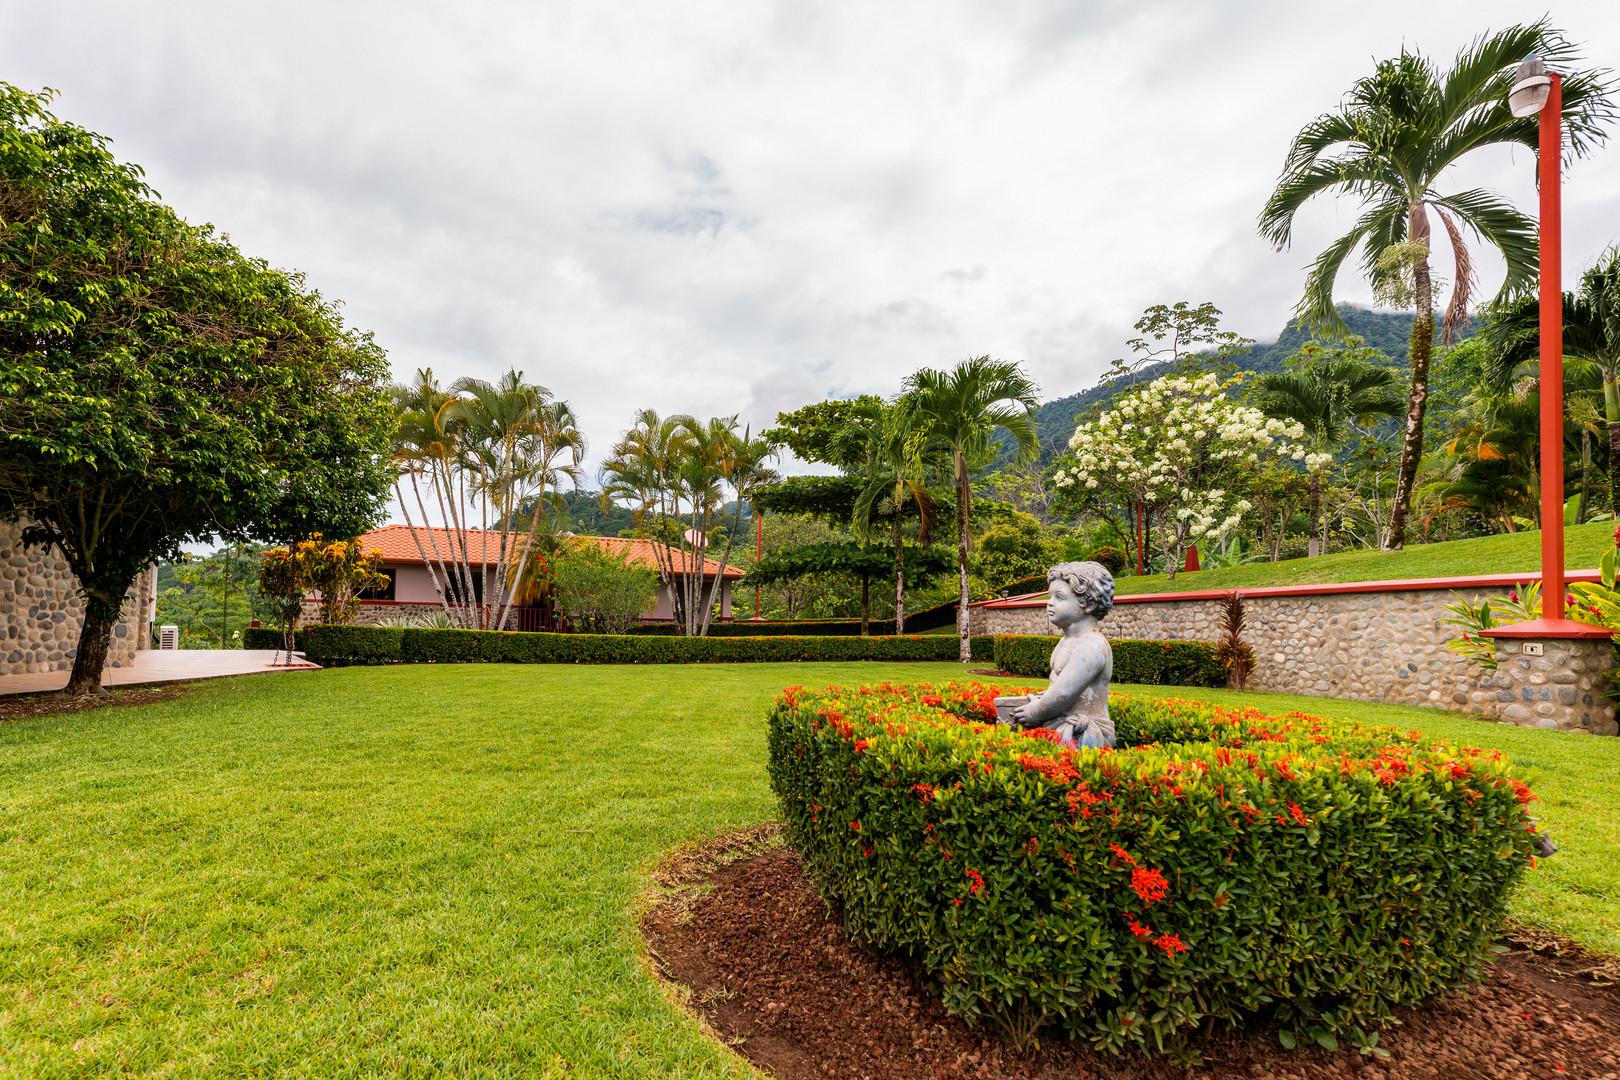 The garden and yoga area